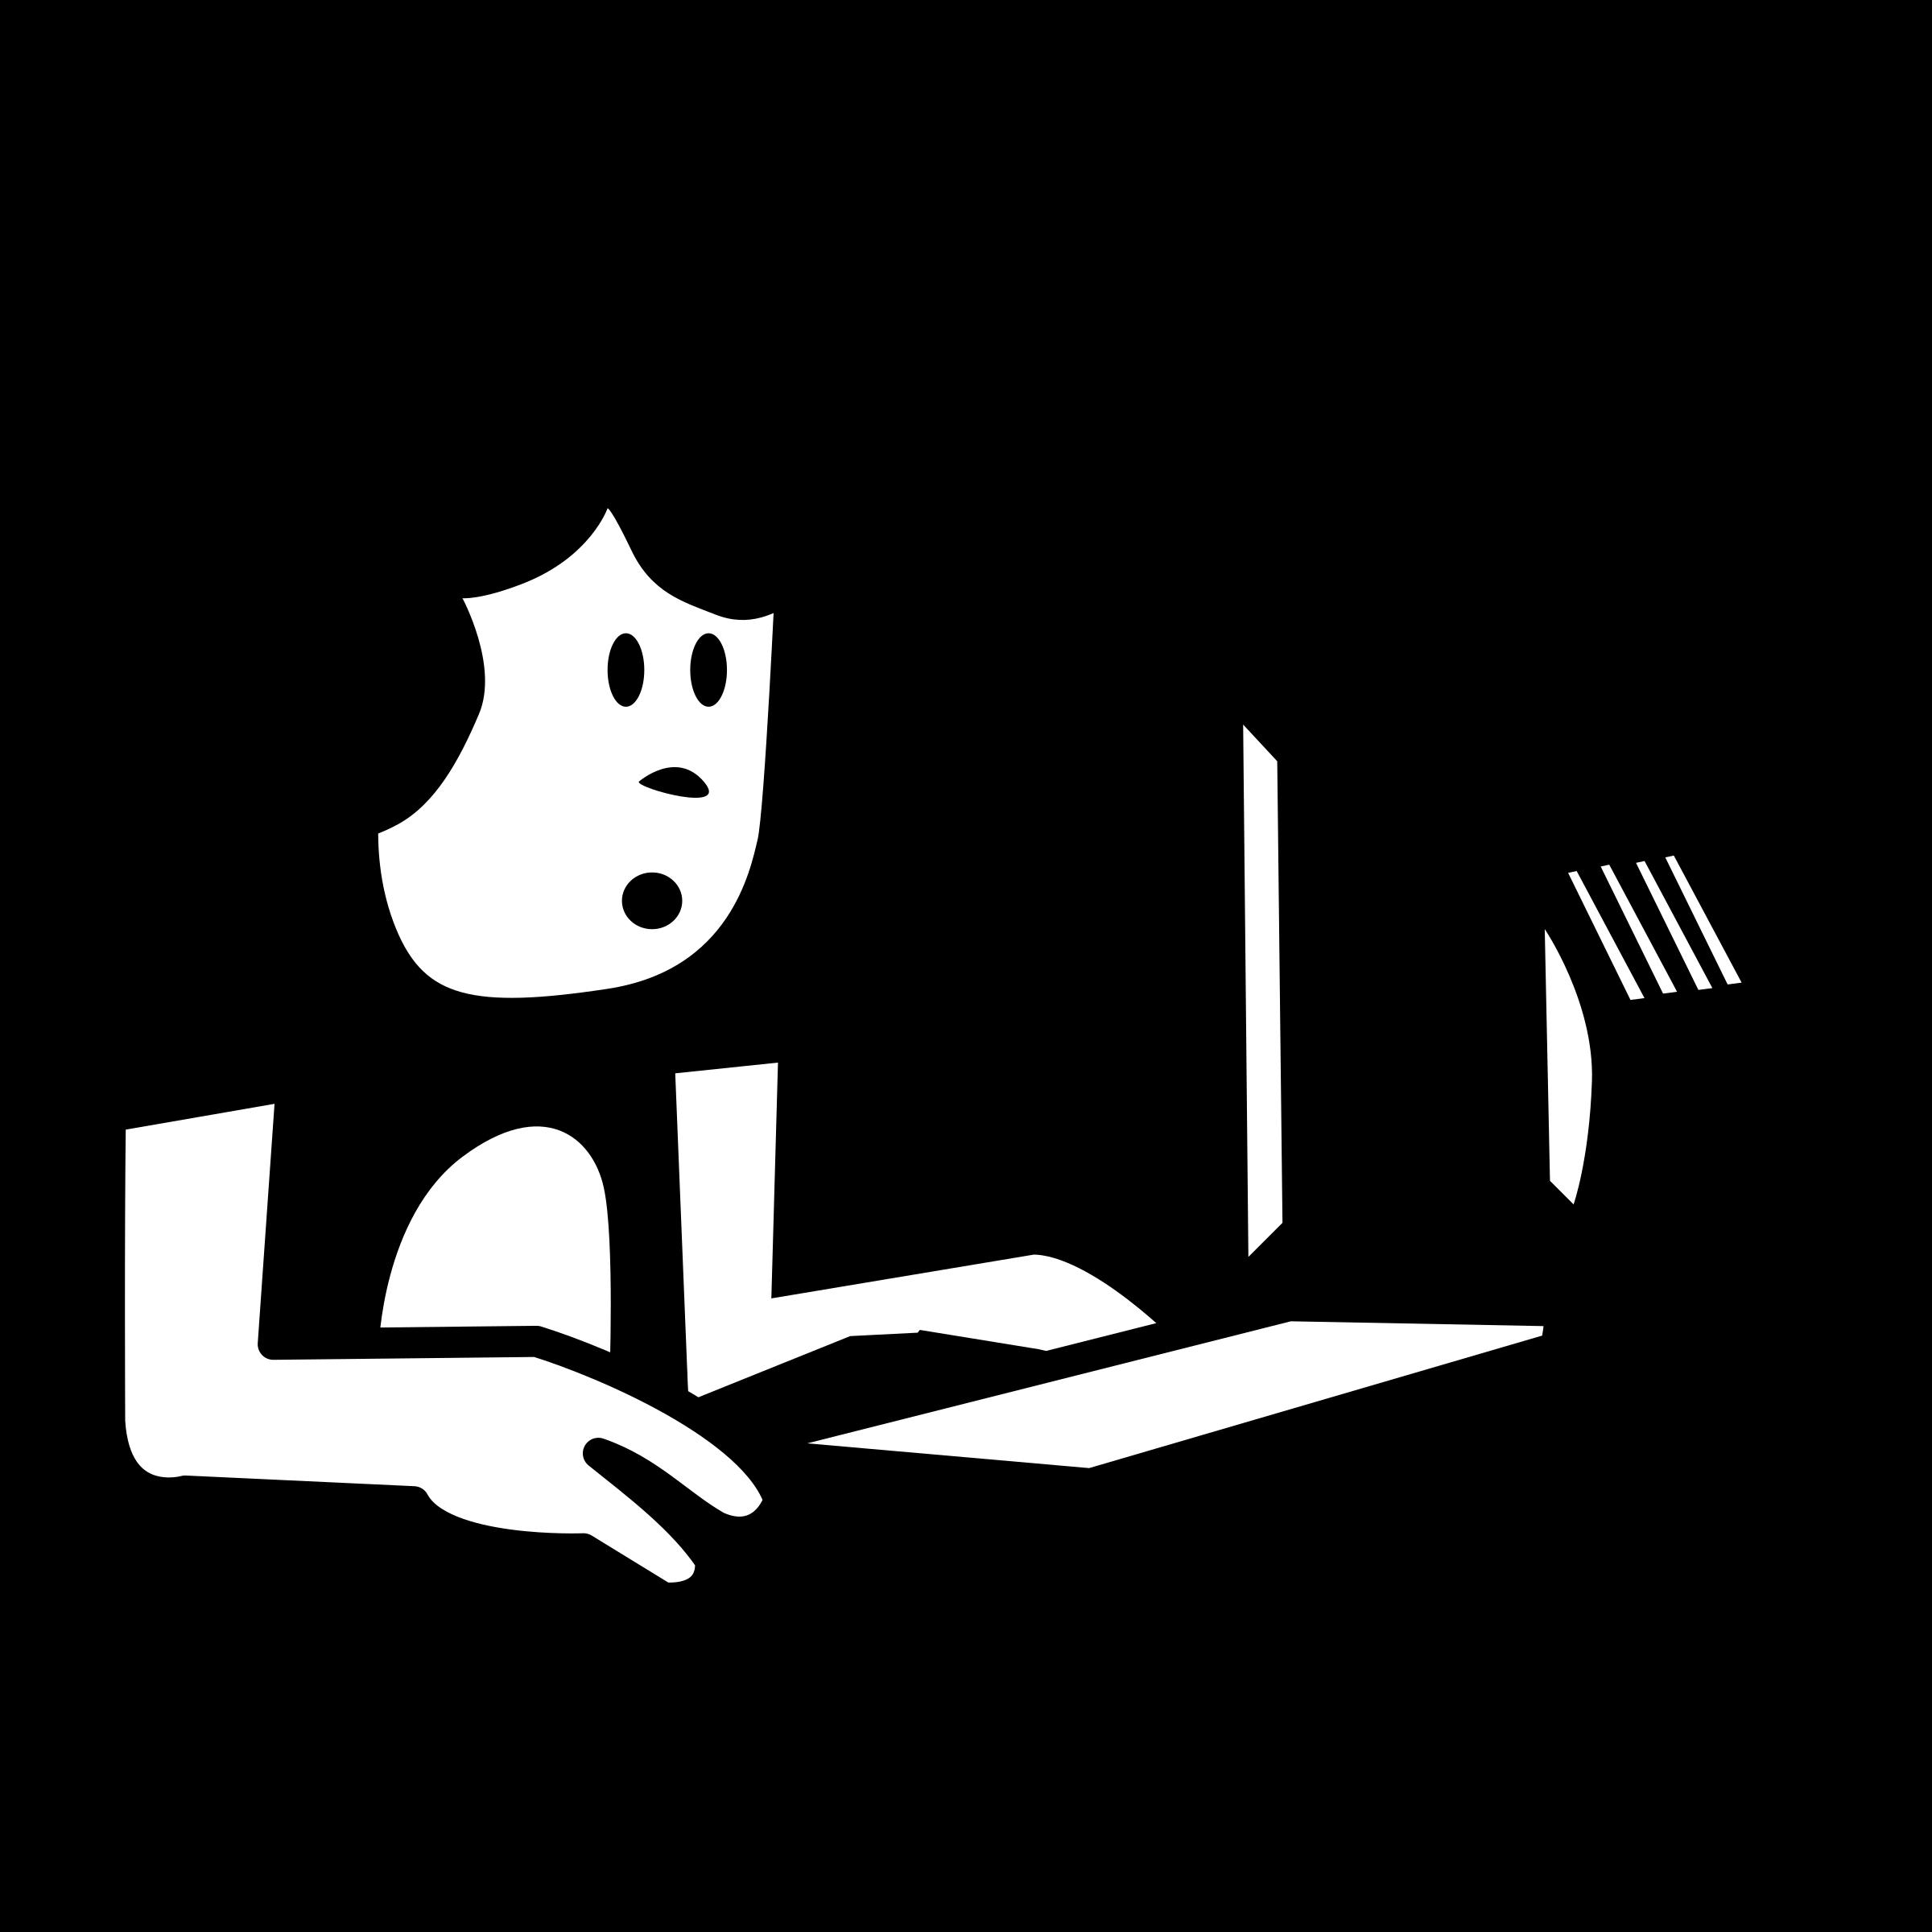 Clipart people computer. Personnage ordinateur big image